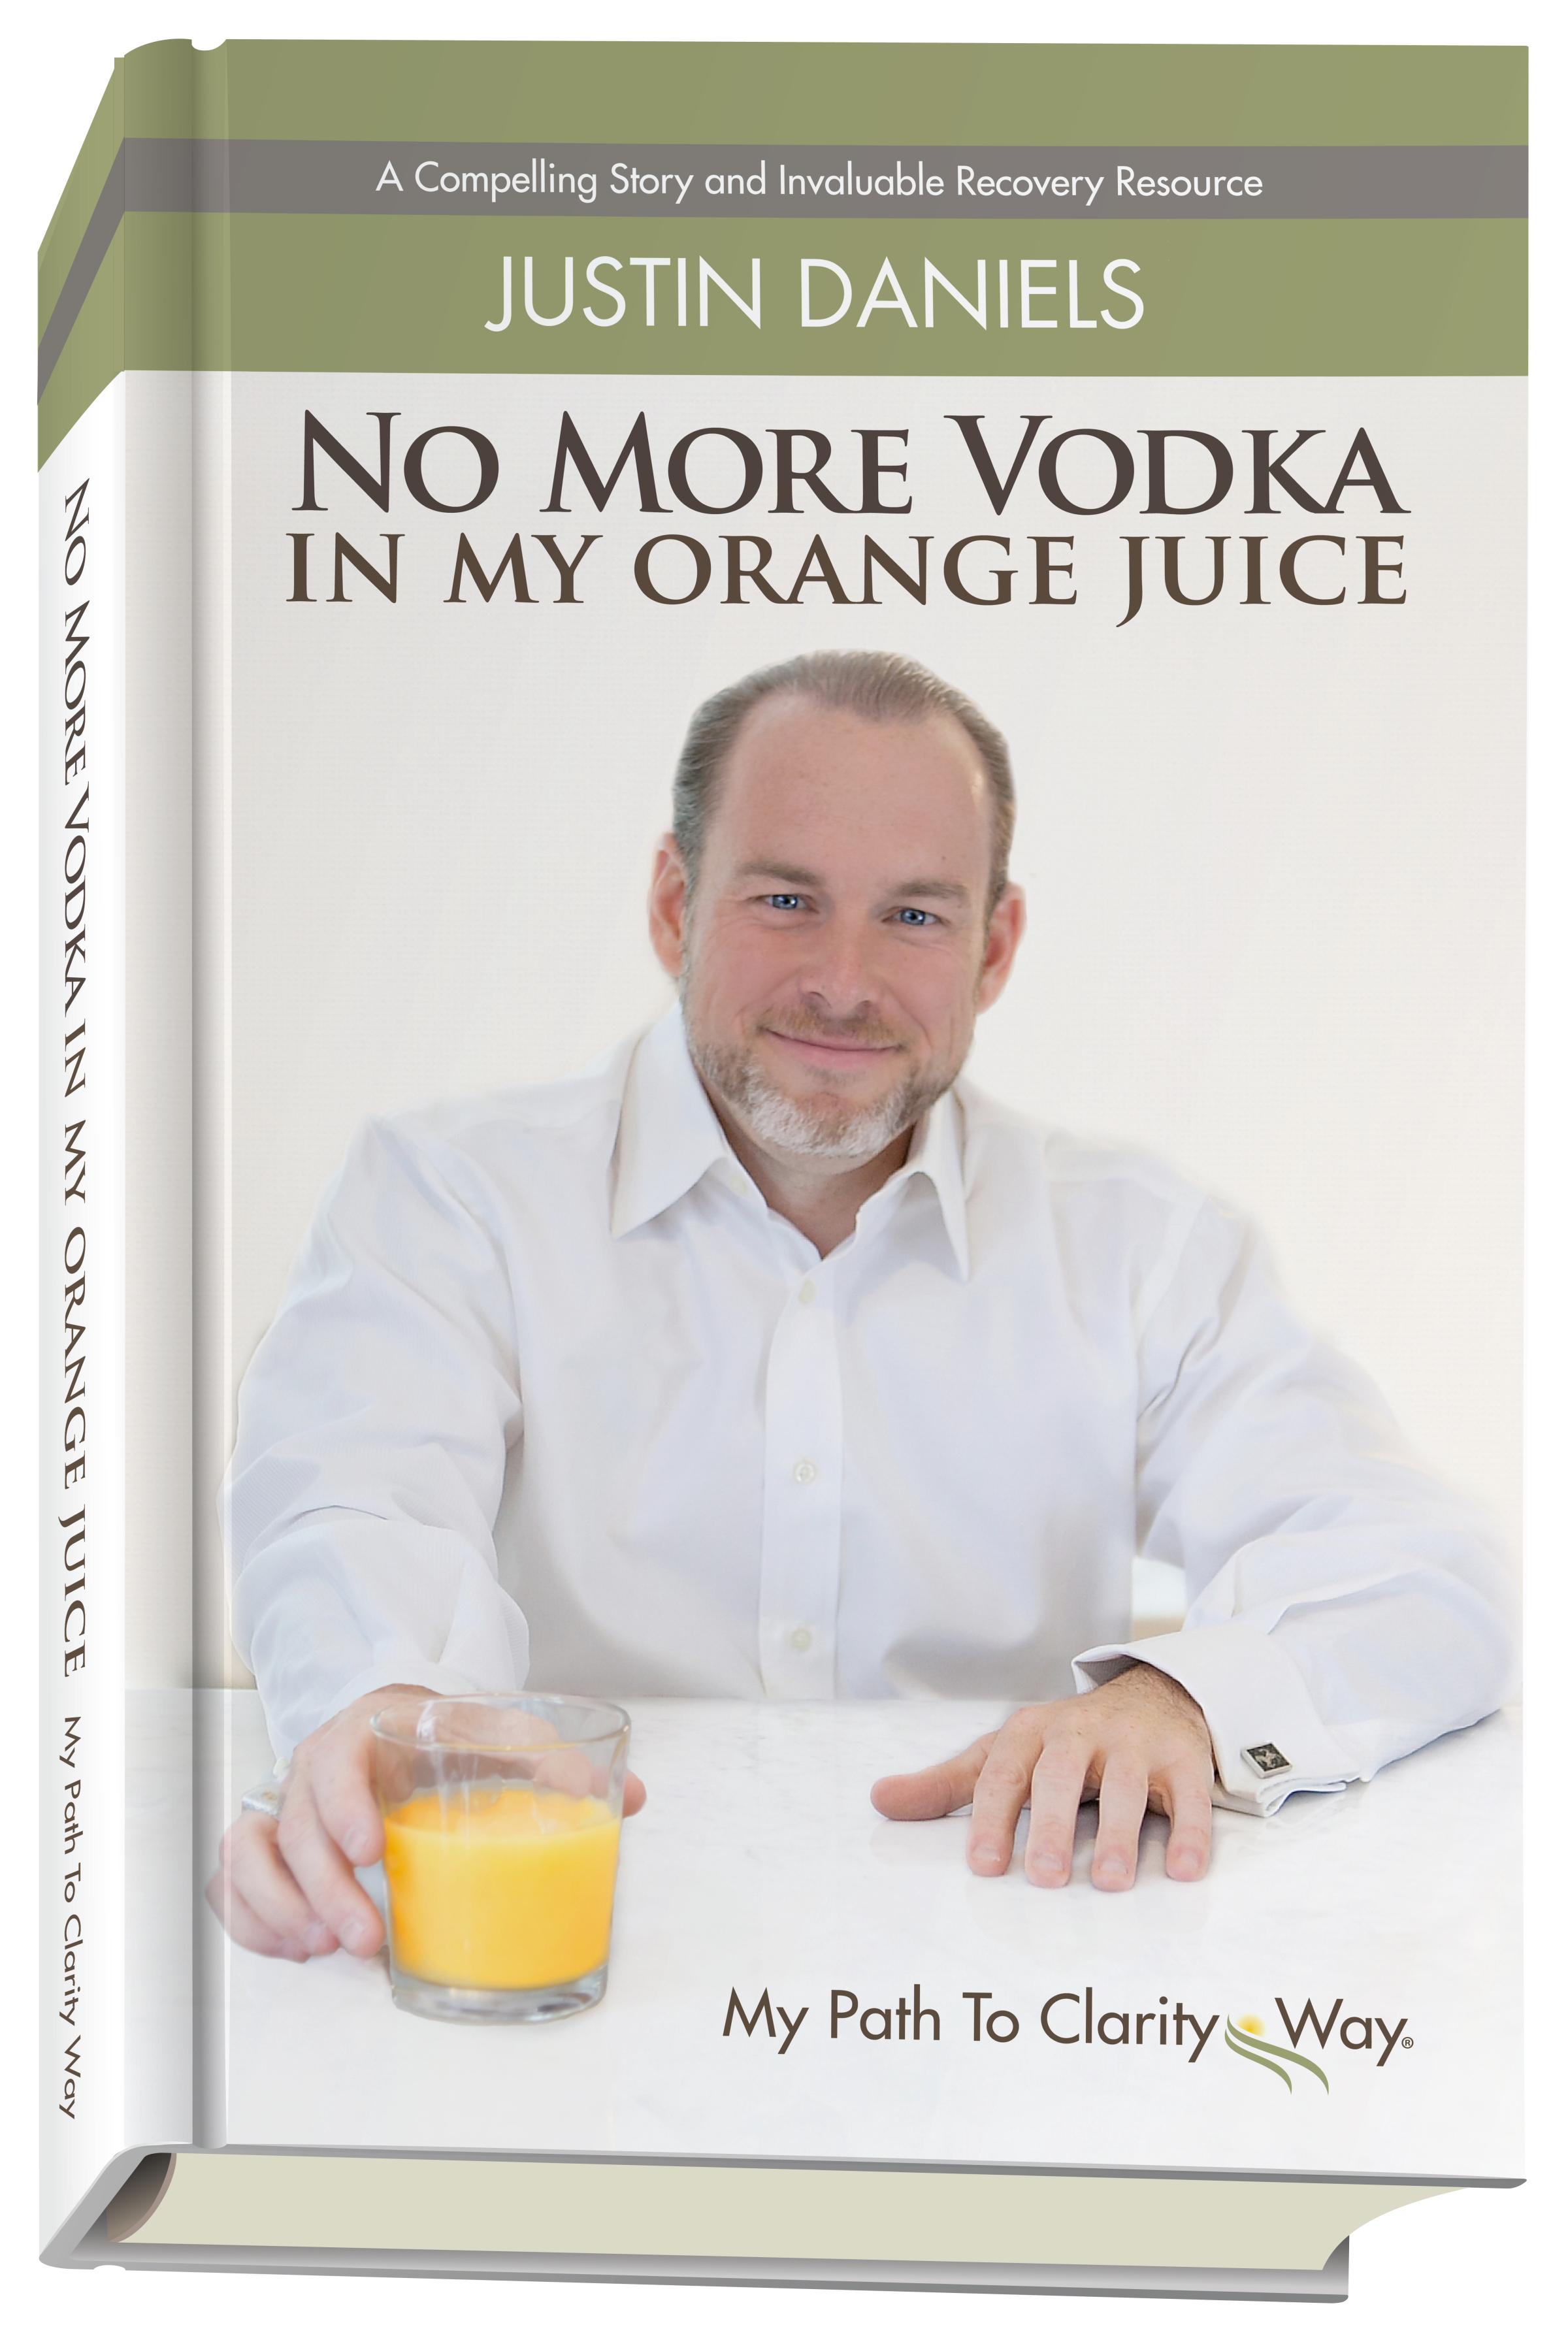 Book No More Vodka in My Orange Juice - Justin Daniels